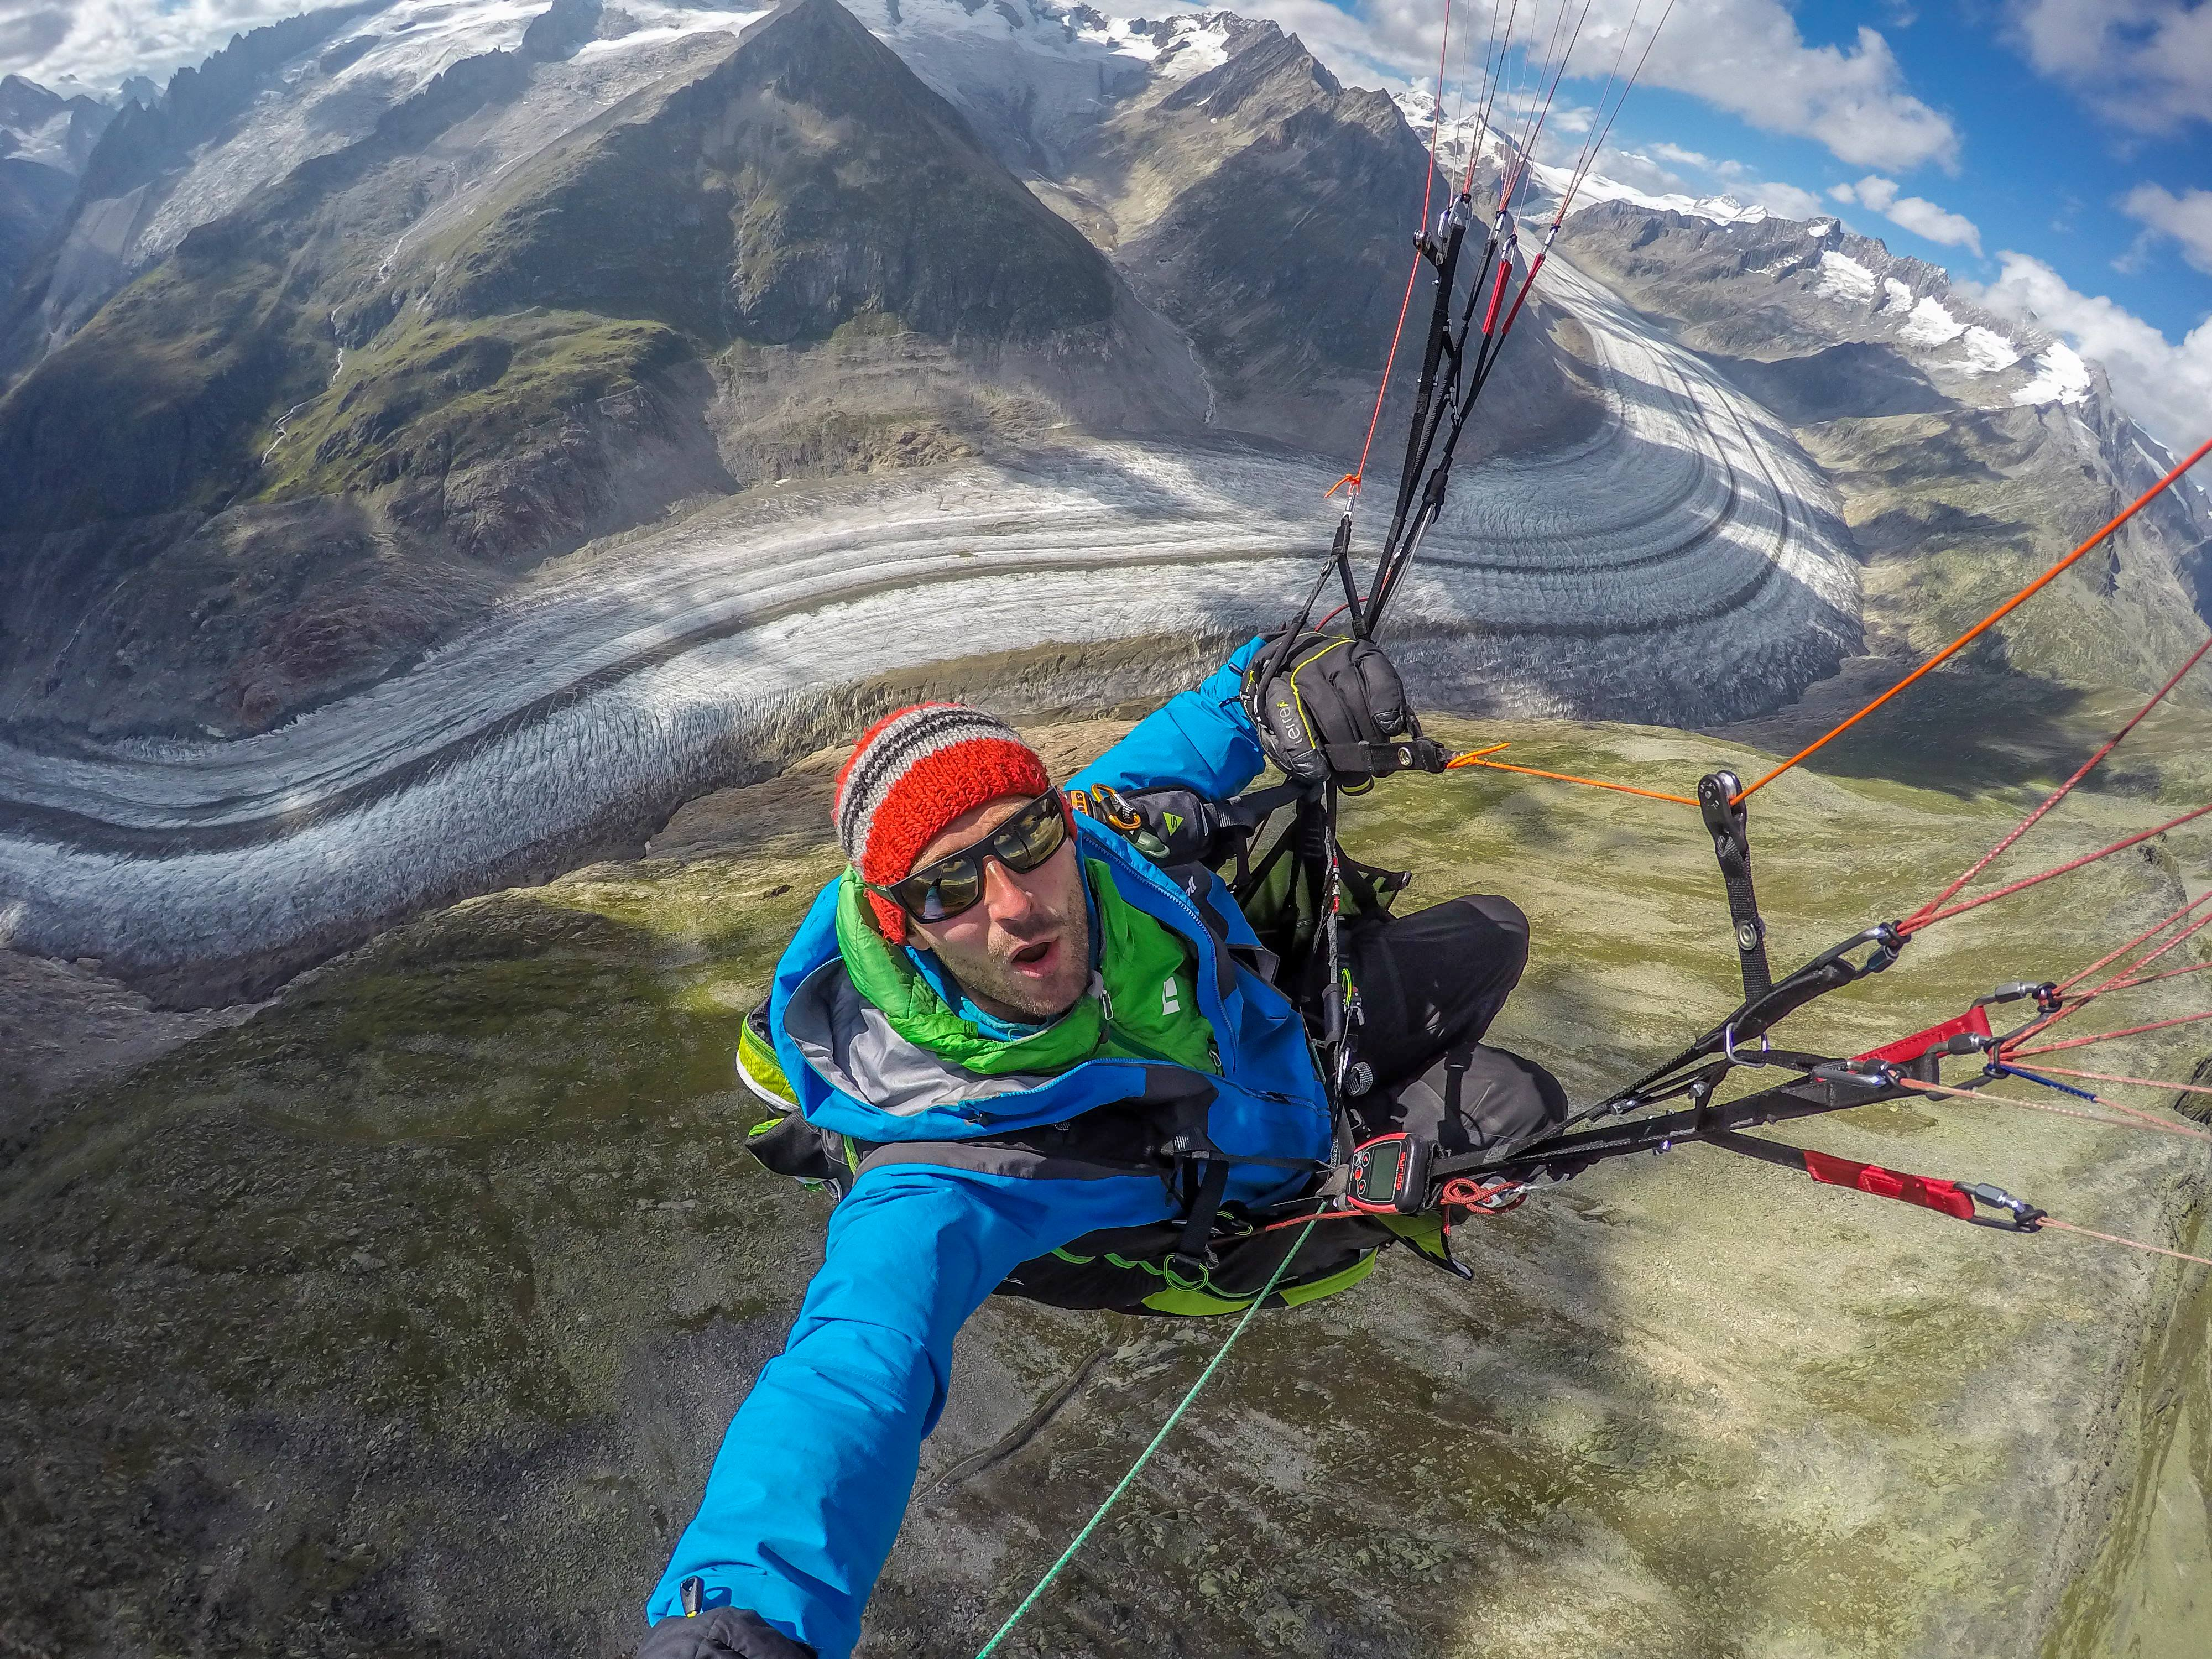 The Alpine Paragliding Line